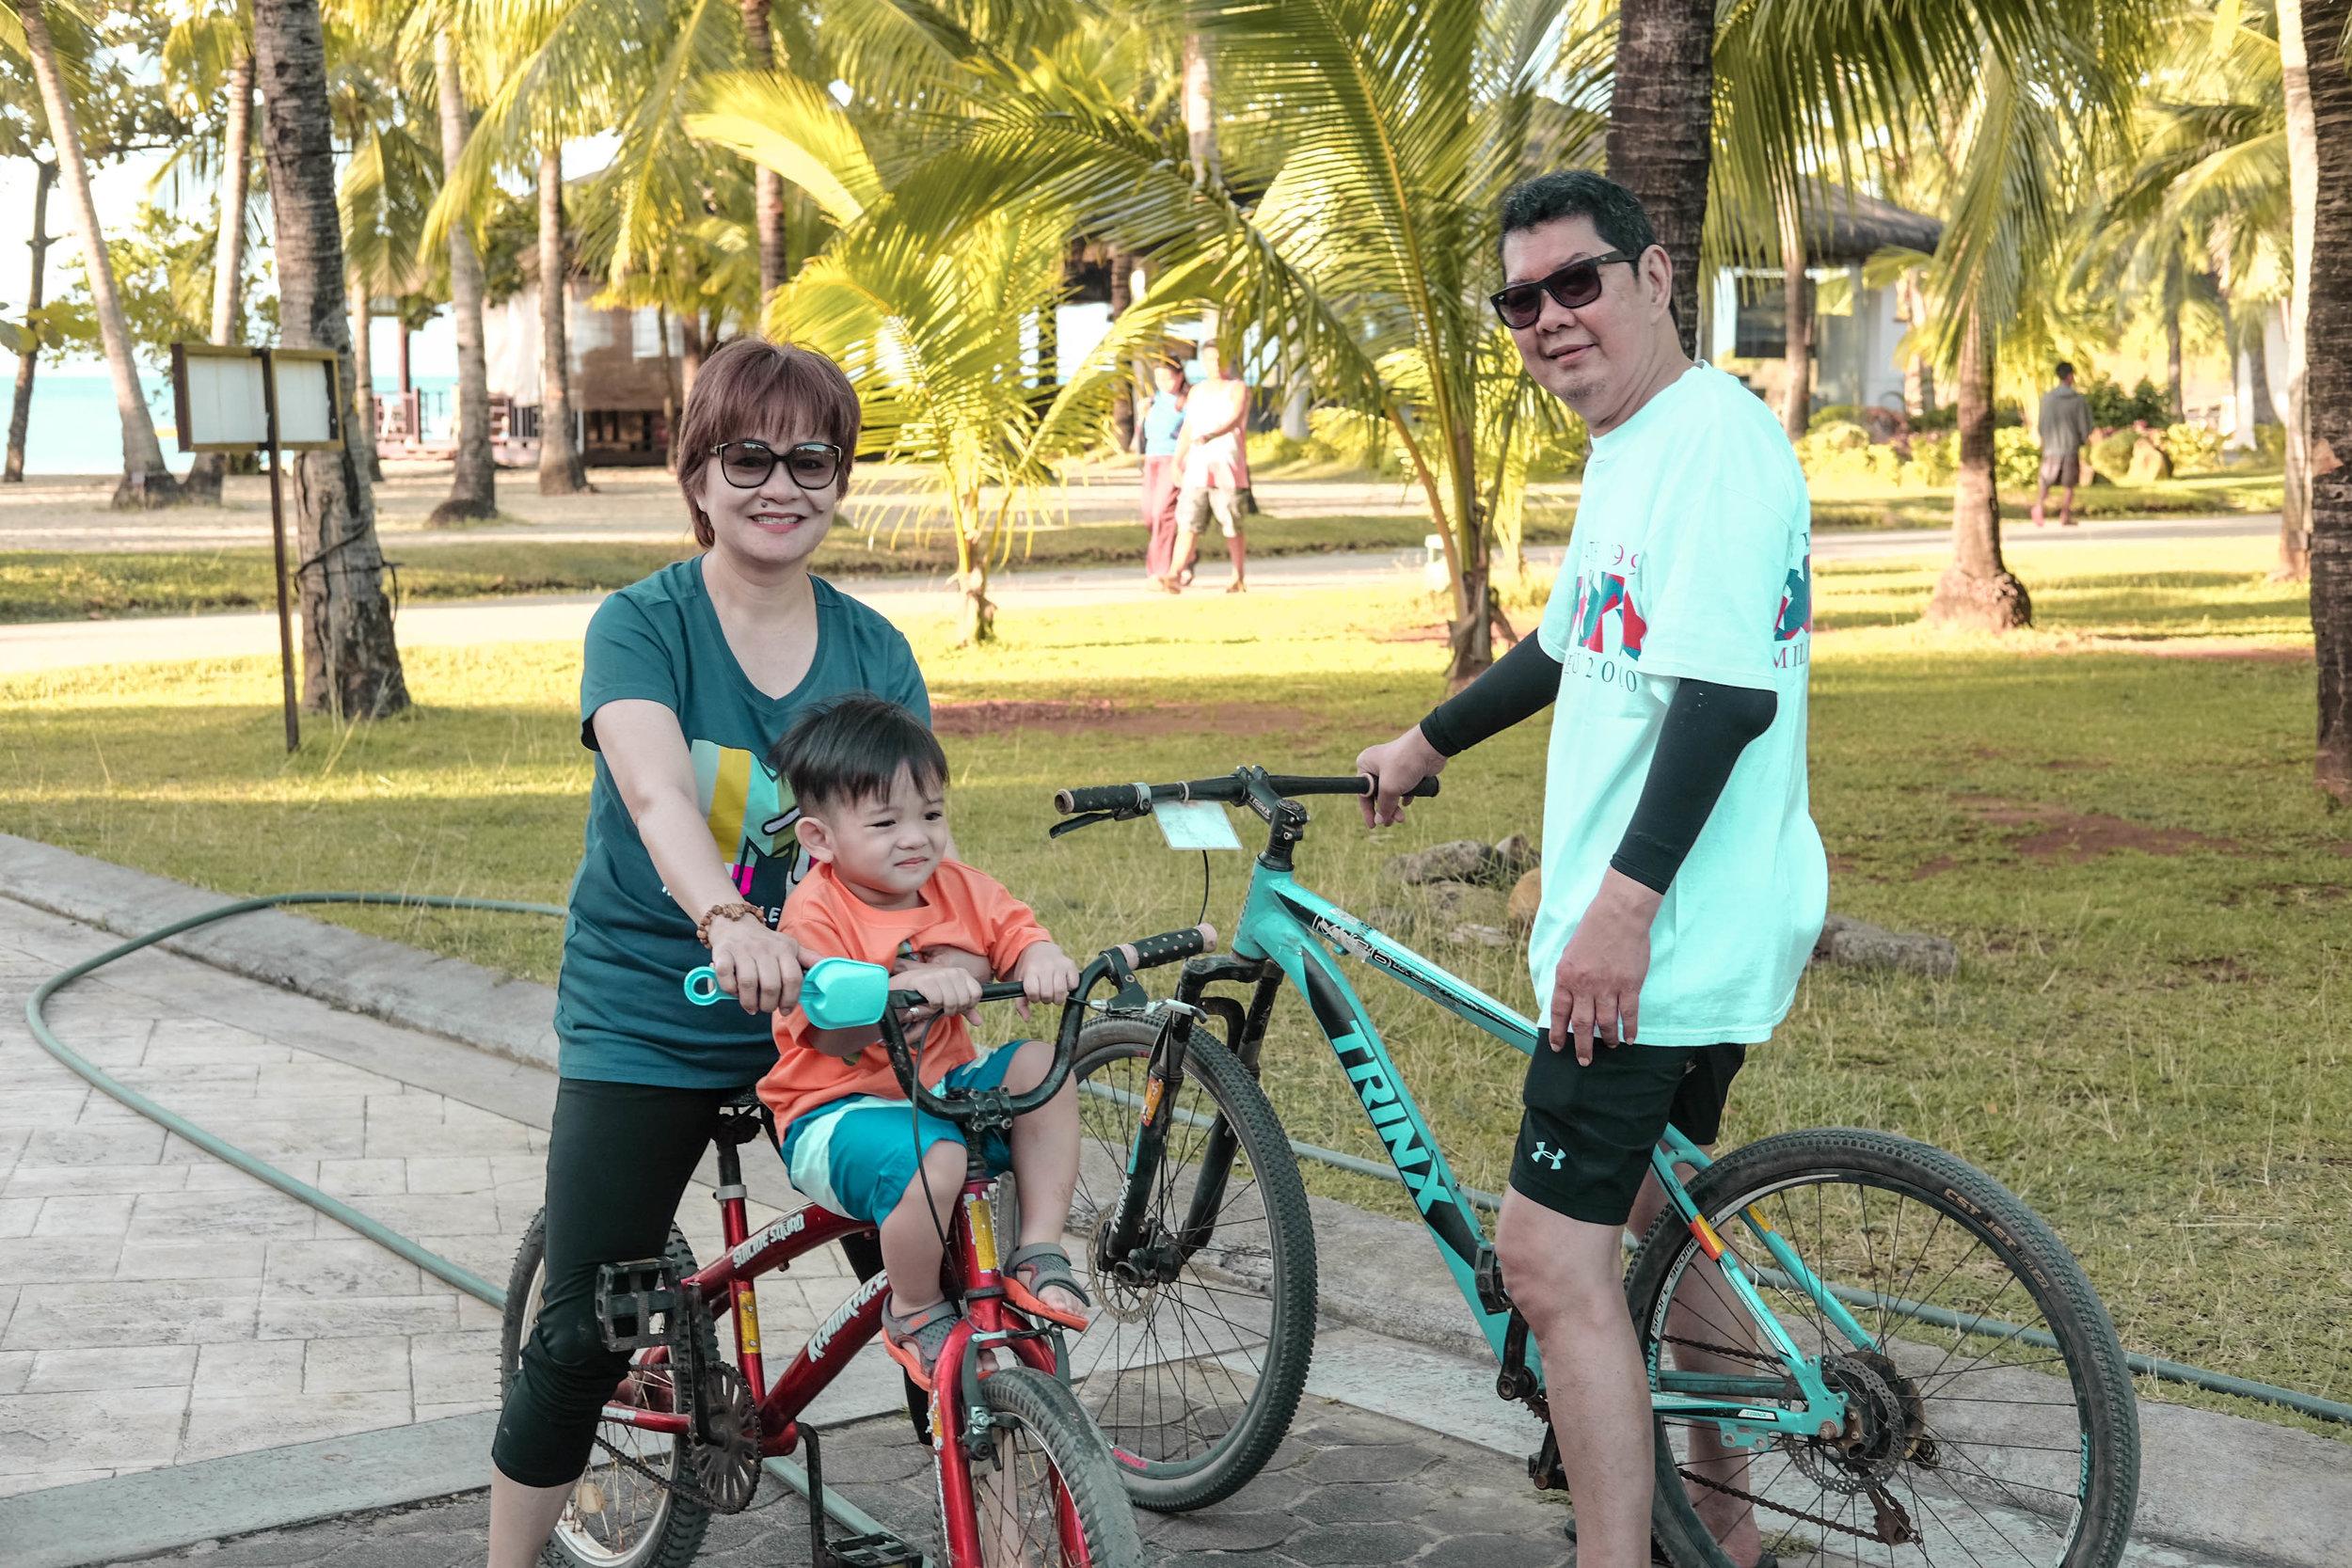 Yñigo with his Papa Jojo and Wowa enjoying the bikes!